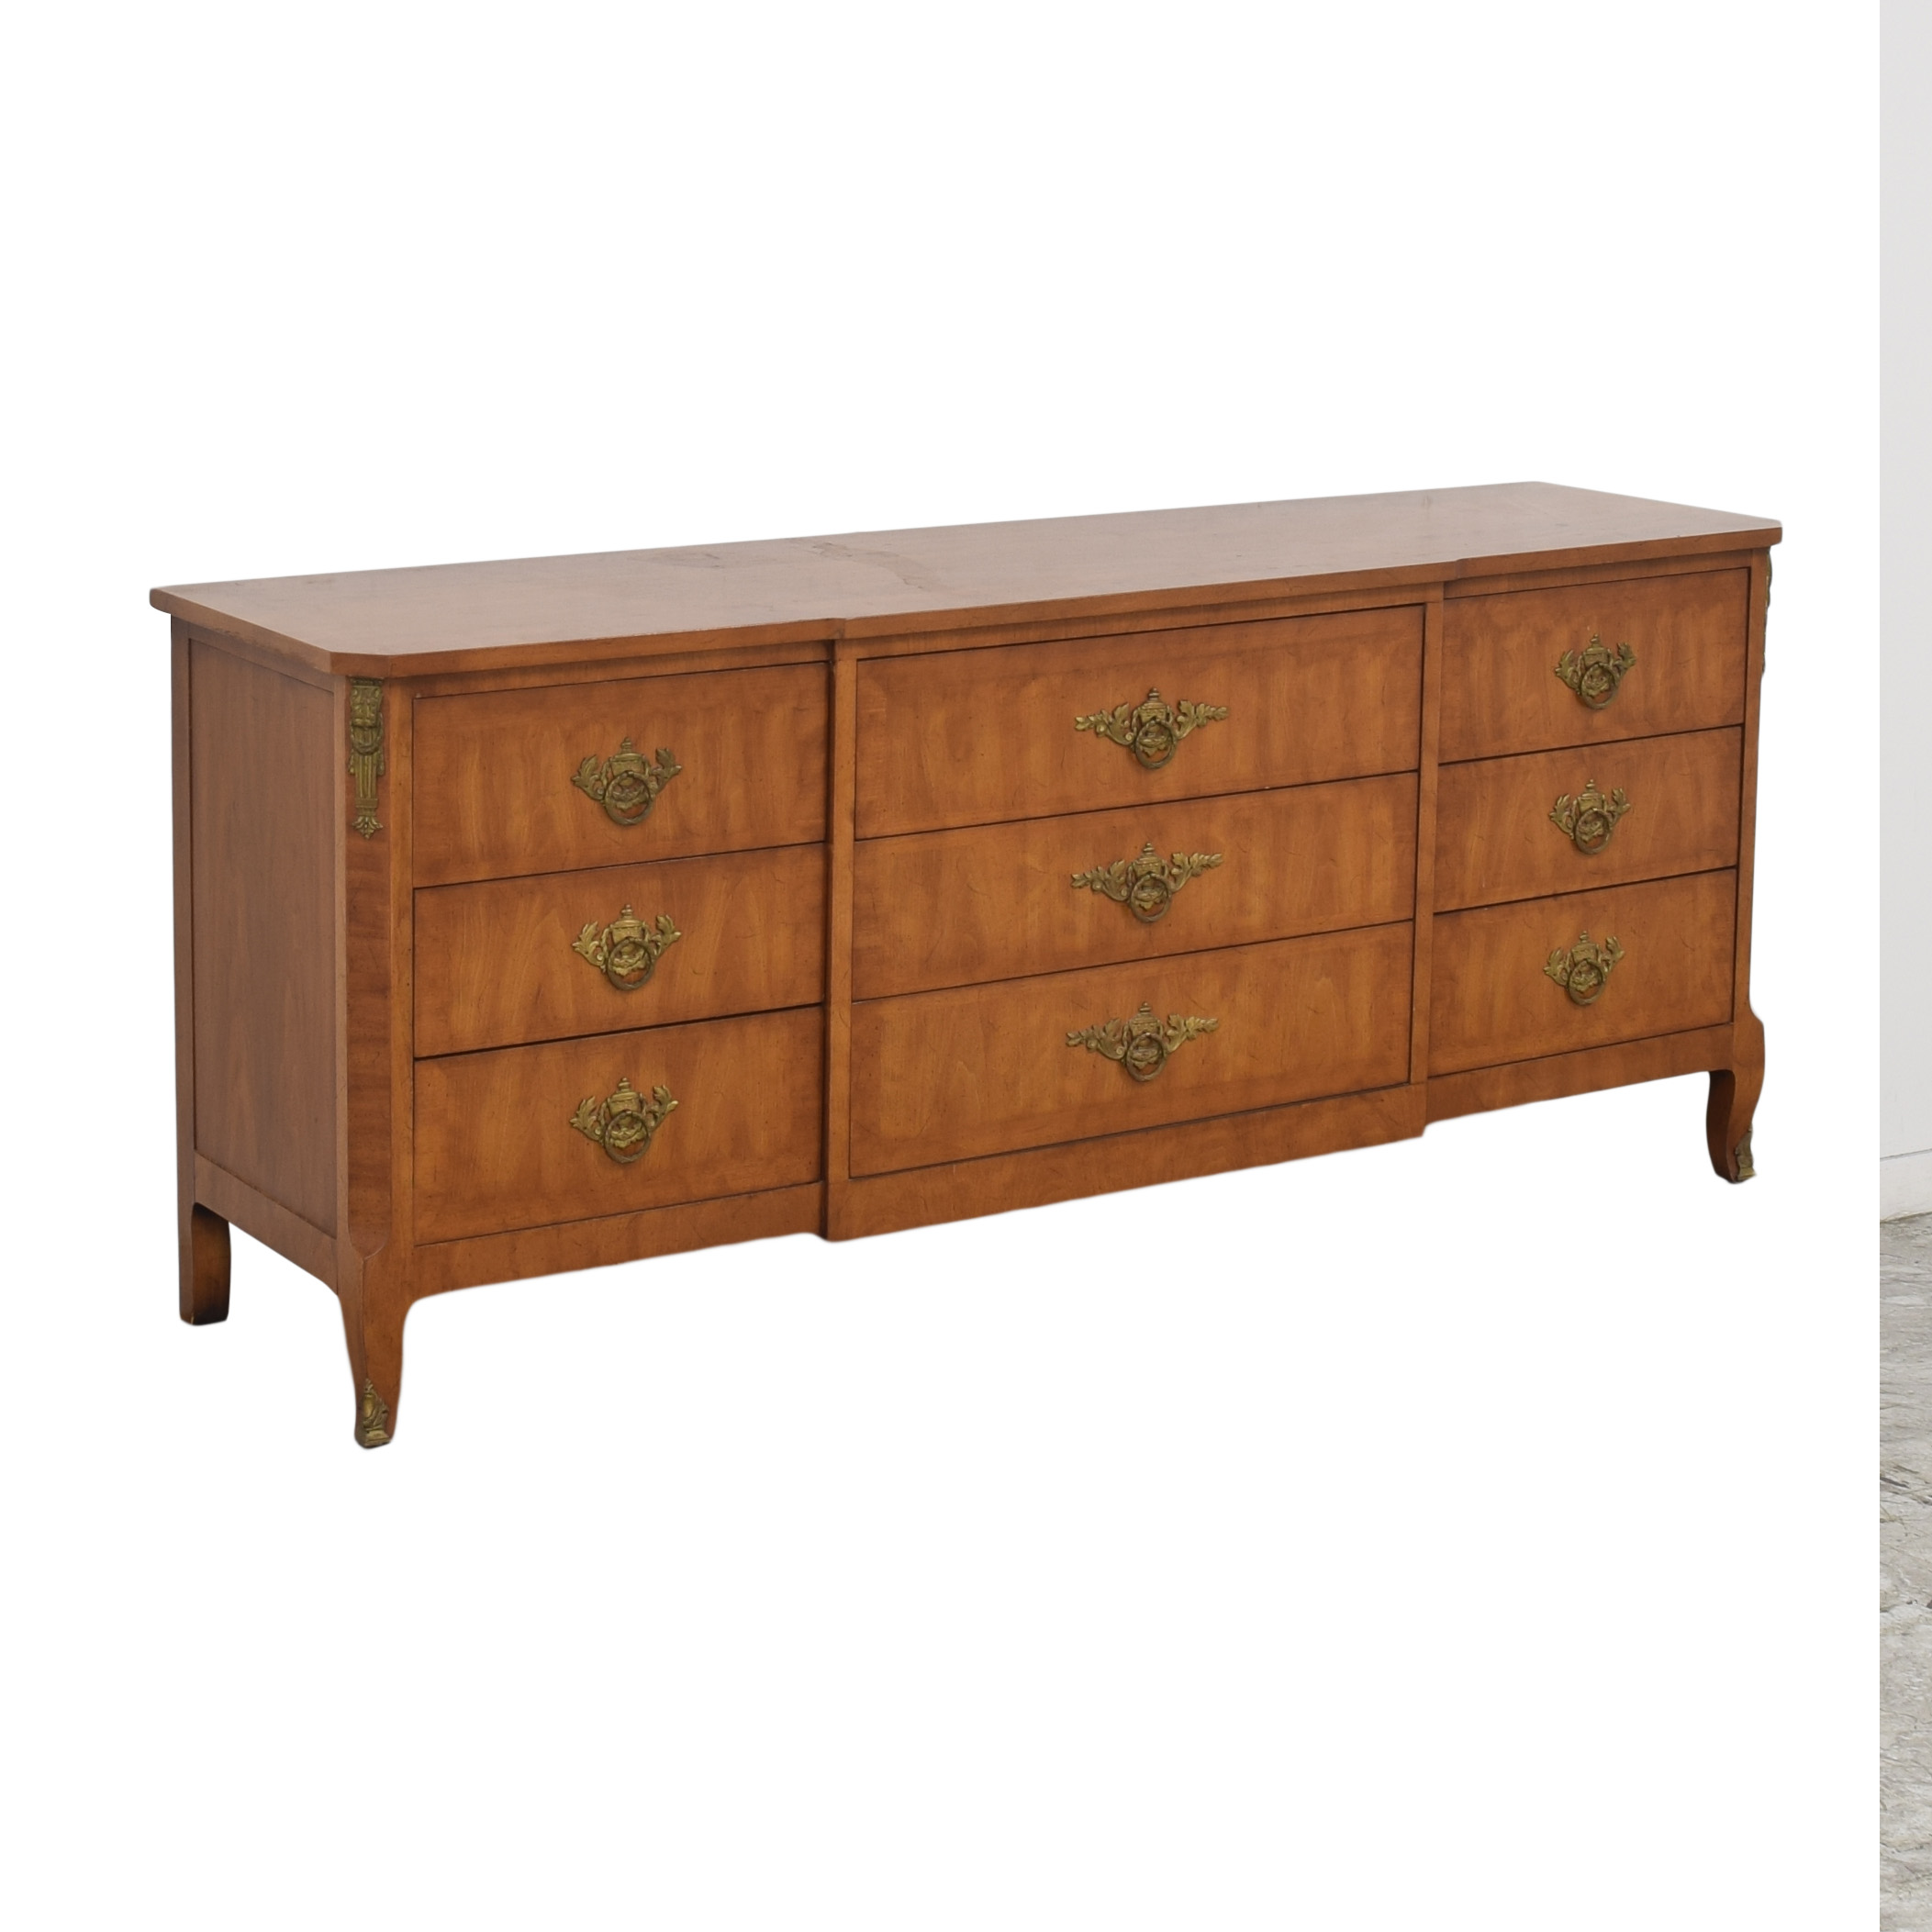 Henredon Furniture Henredon Triple Dresser on sale